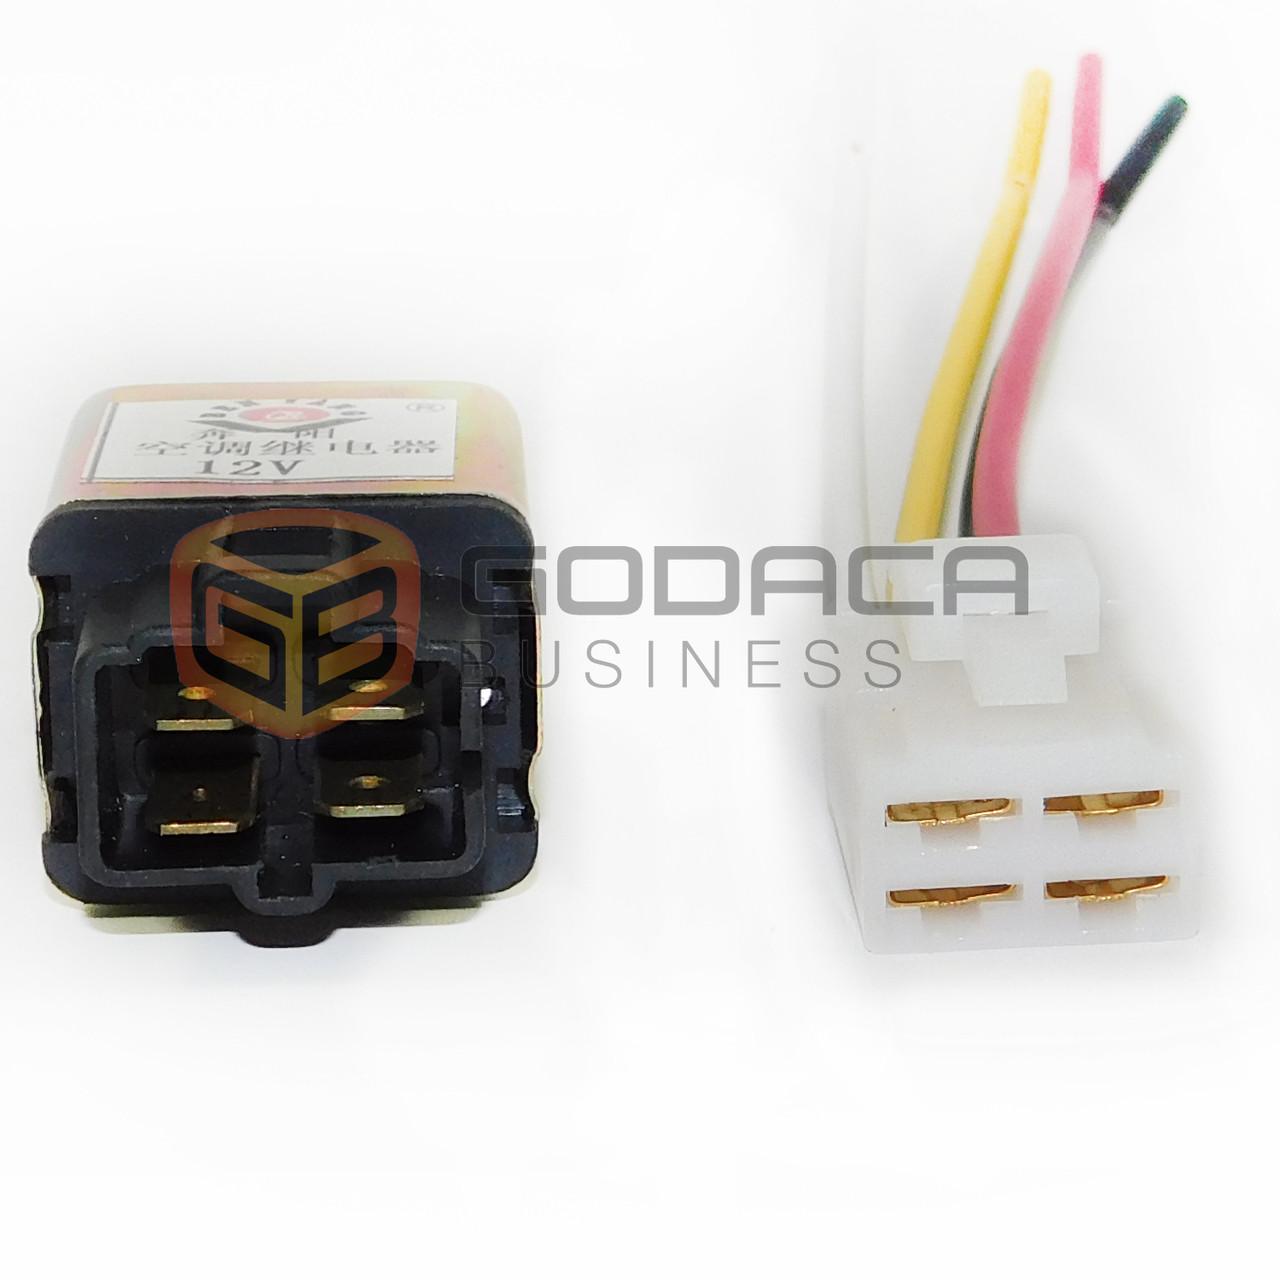 medium resolution of 1x 4 pin relay and socket harness connector universal for chevrolet hyundai kia godaca llc